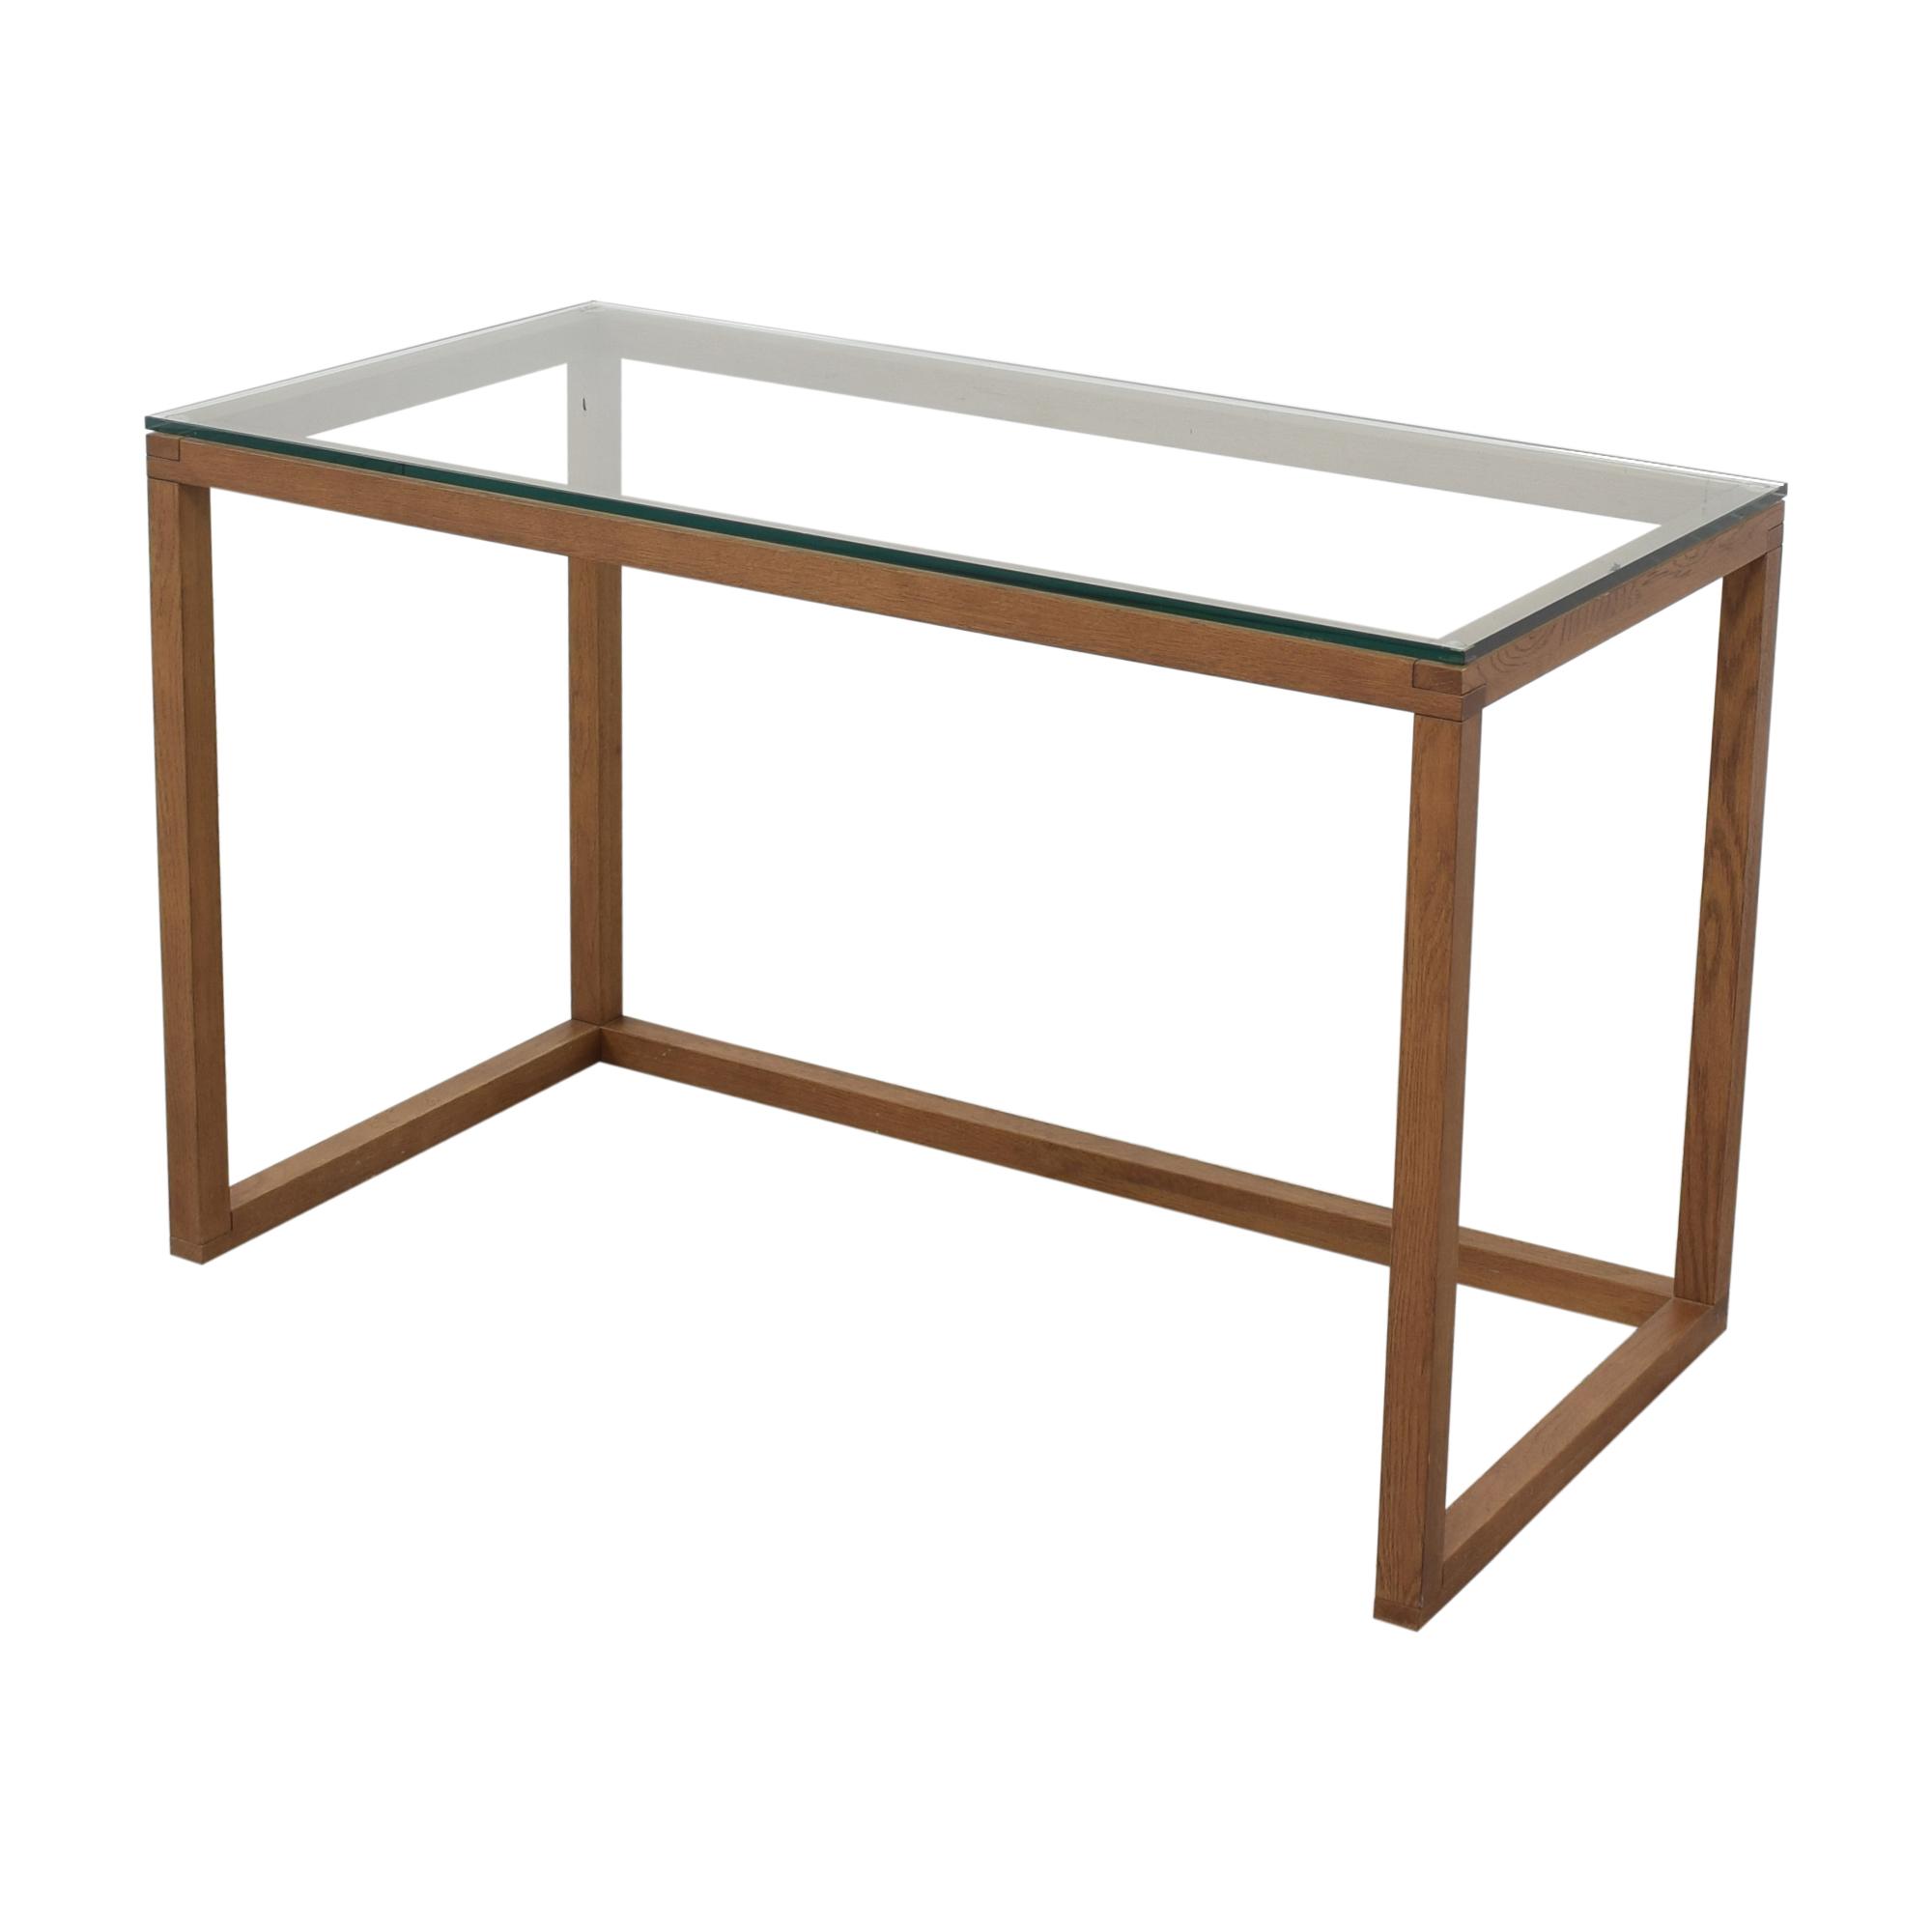 Crate & Barrel Crate & Barrel Anderson Desk used